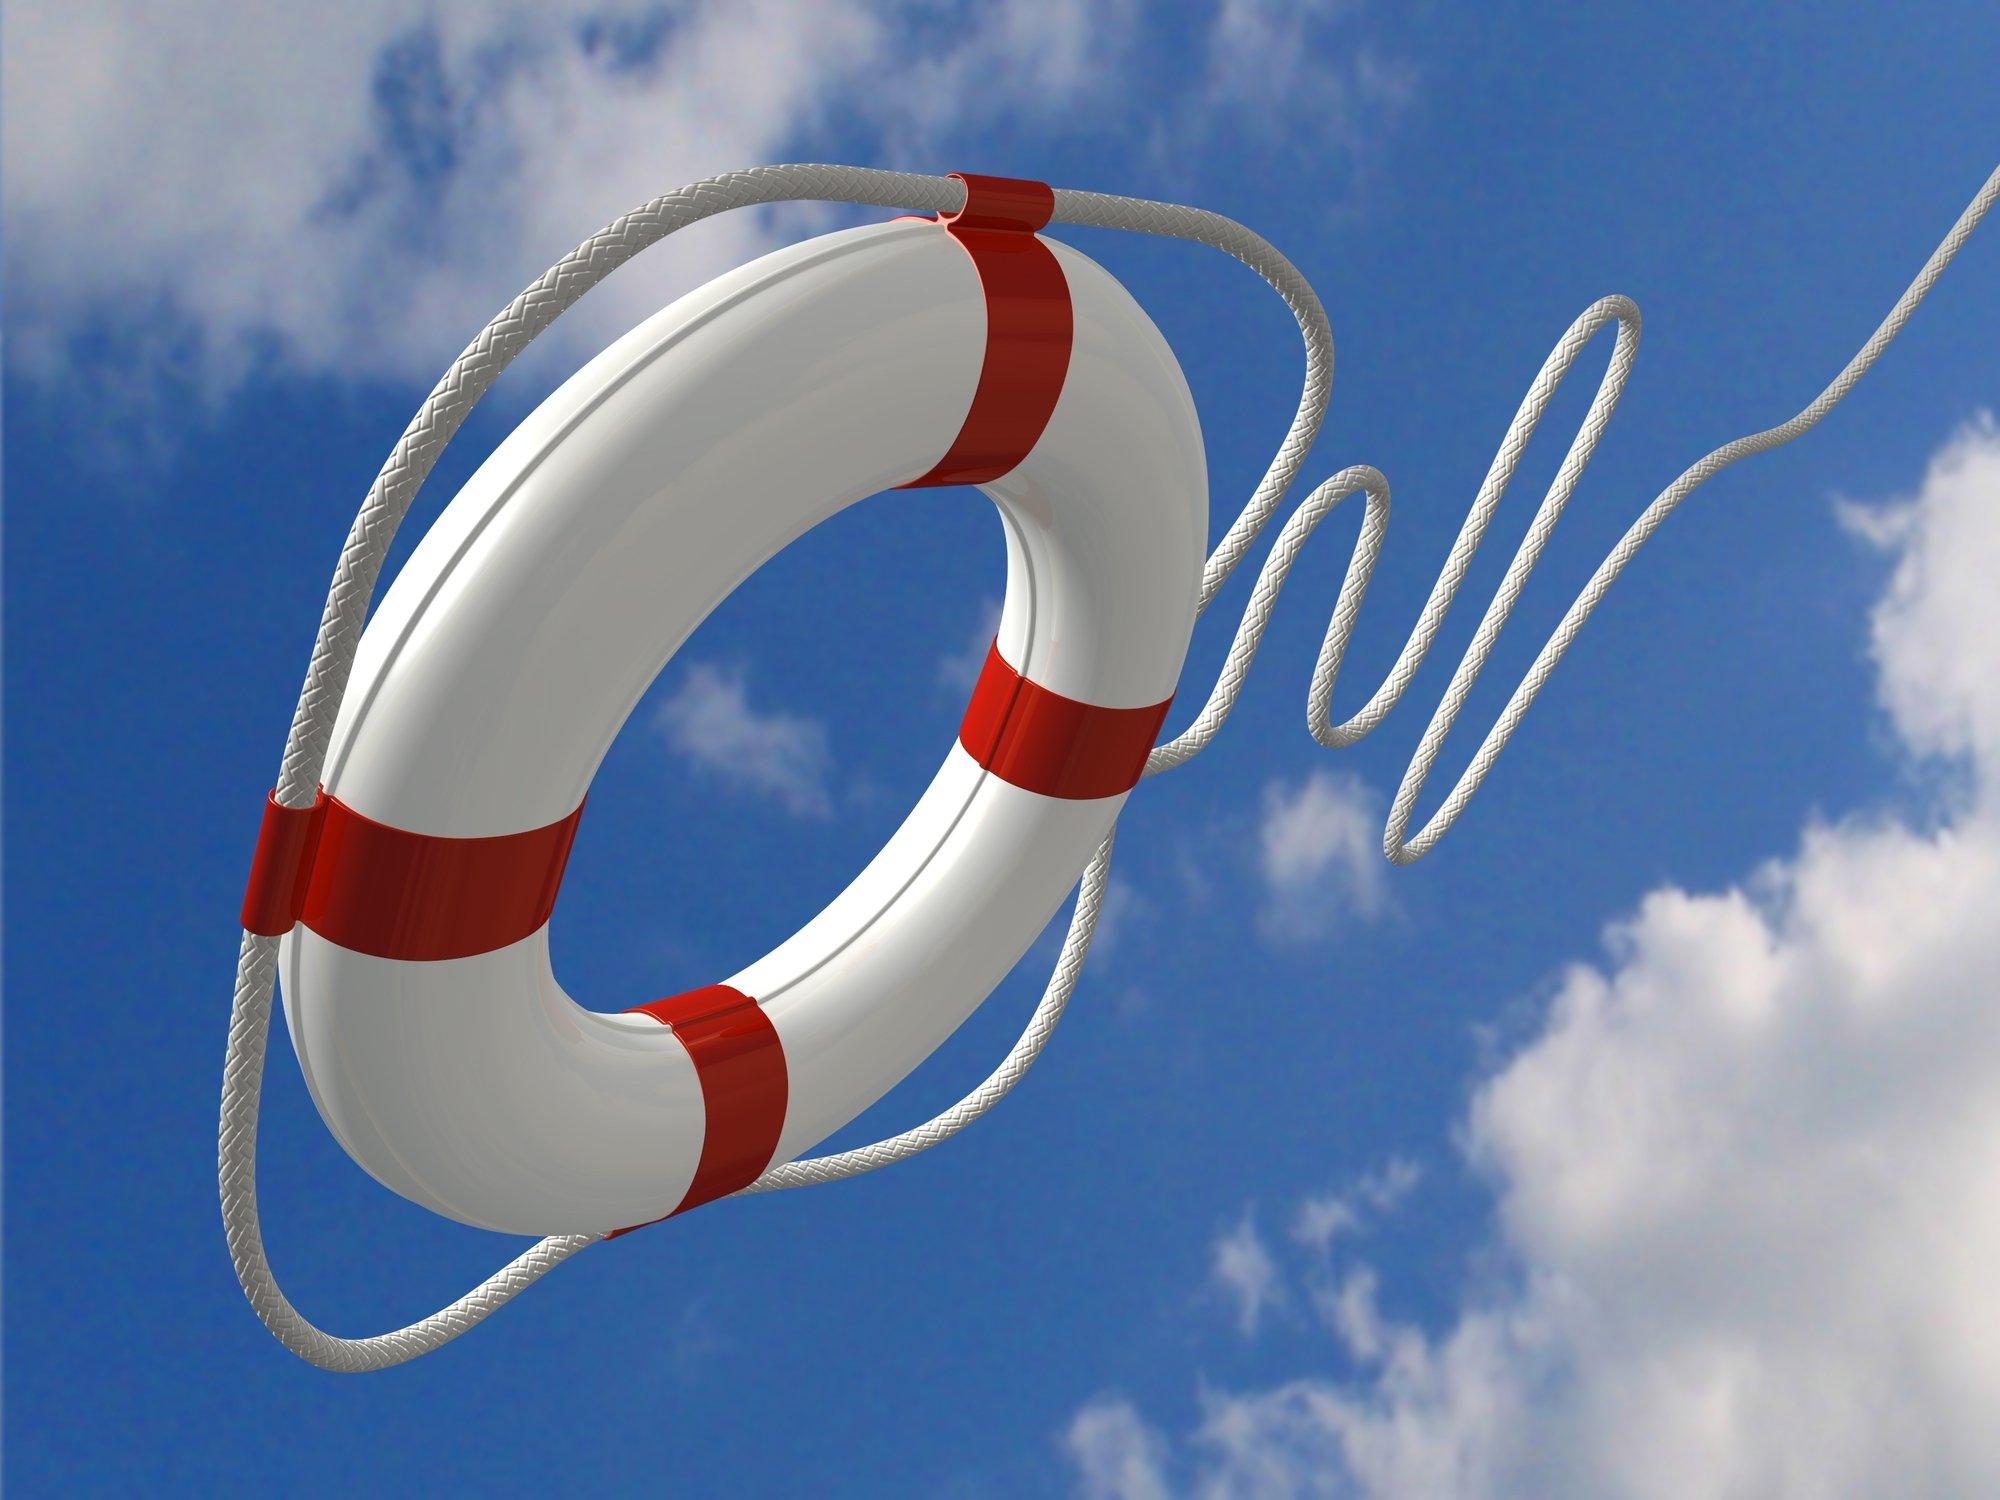 Help with lifebuoy